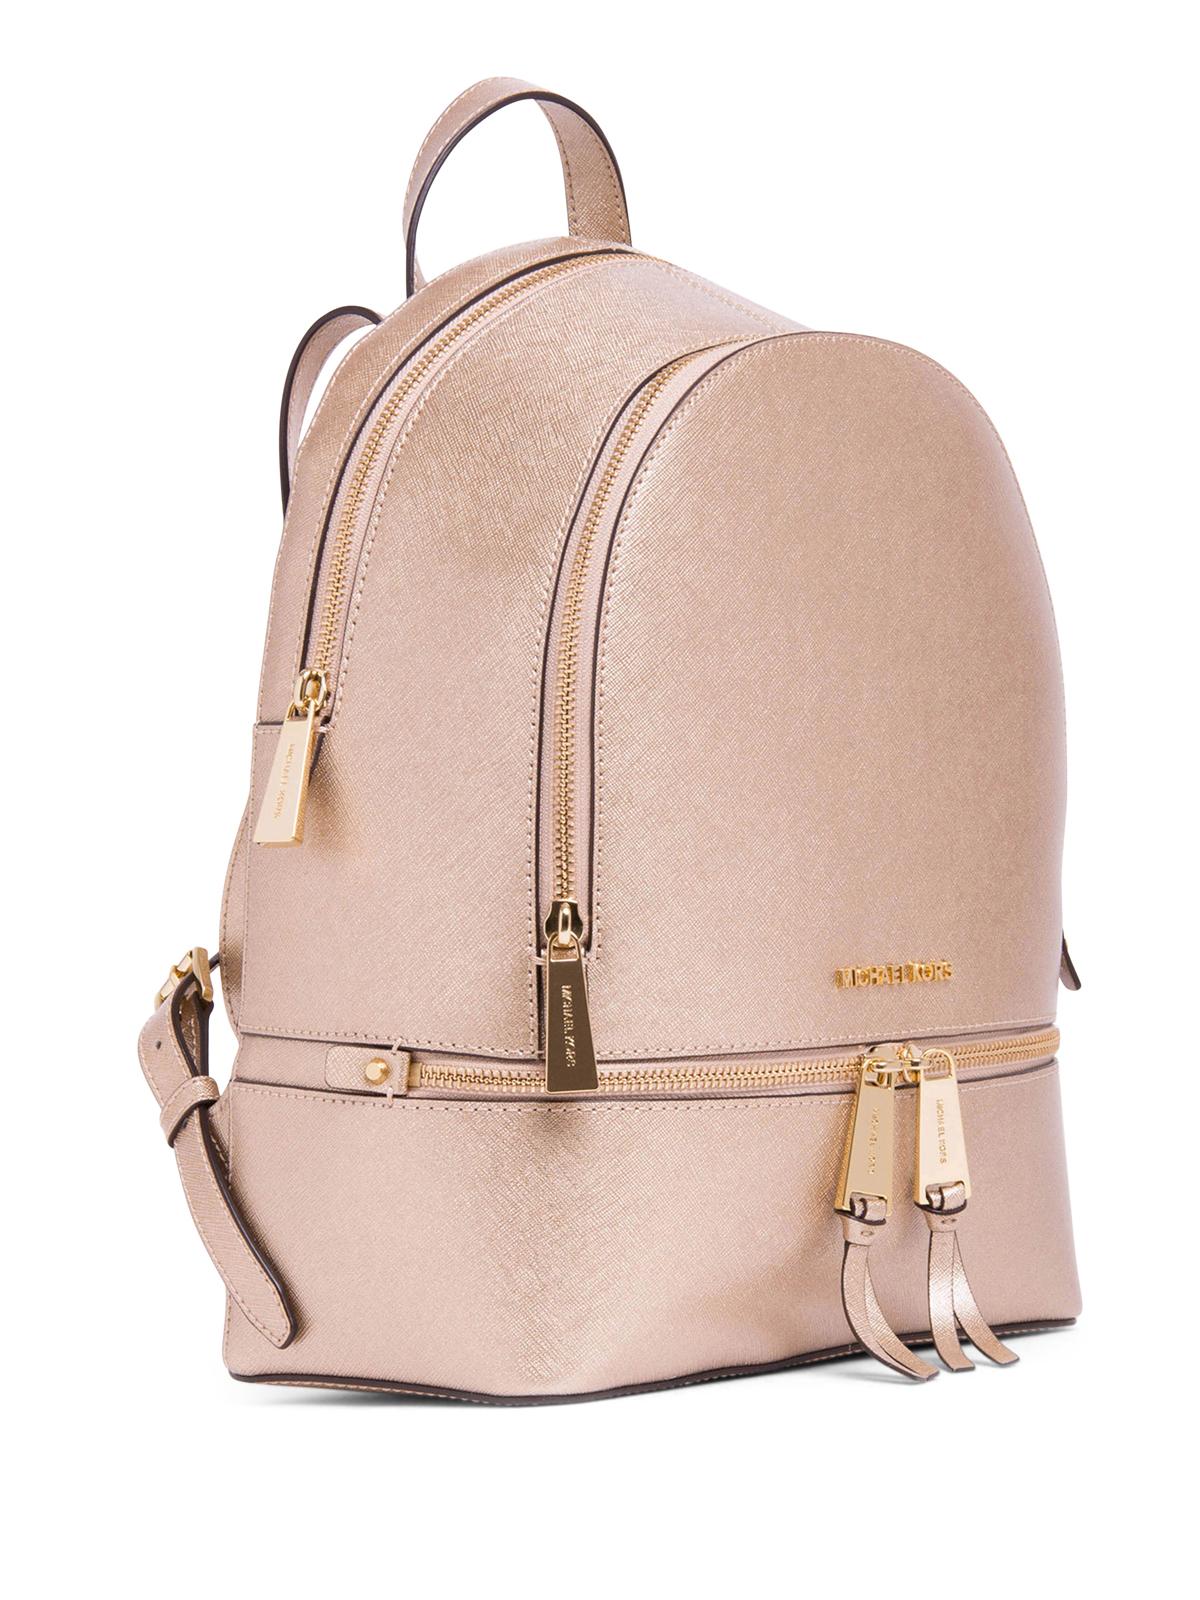 0f898272936f MICHAEL KORS: backpacks online - Metallic Saffiano Rhea backpack